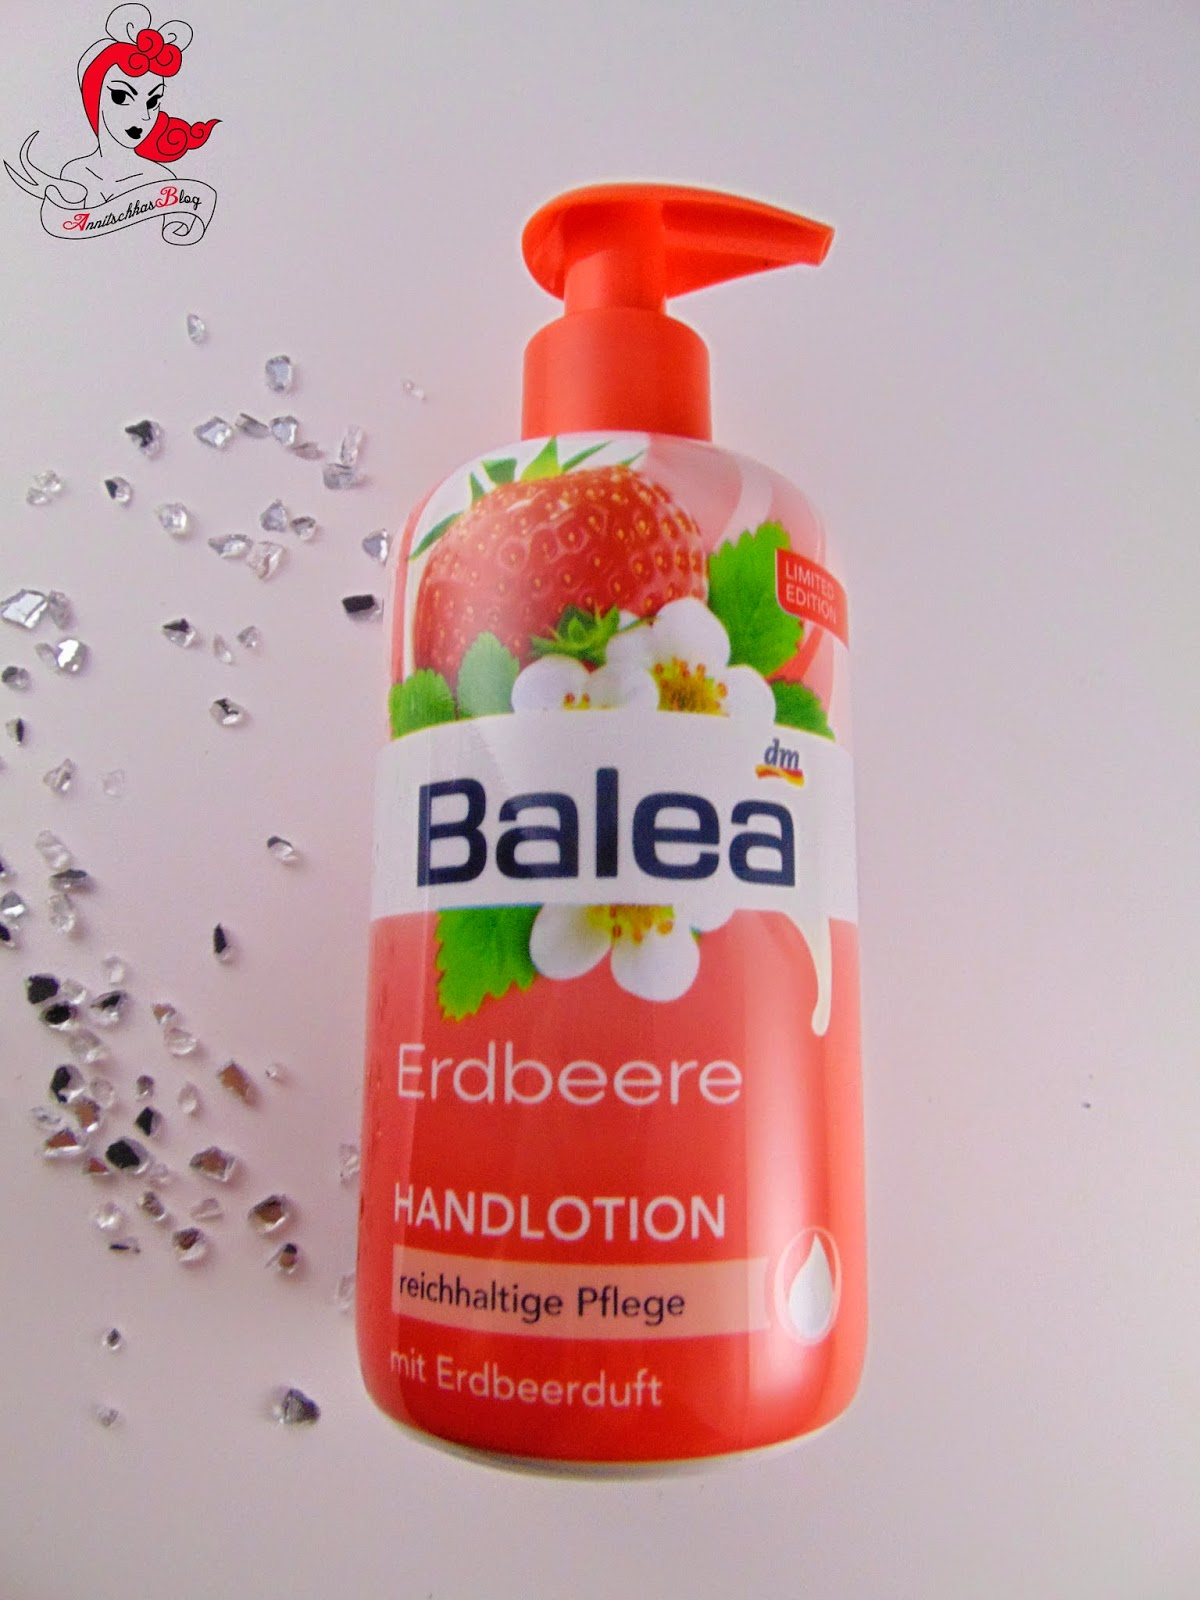 Balea Erdbeere Handlotion - www.annitschkasblog.de